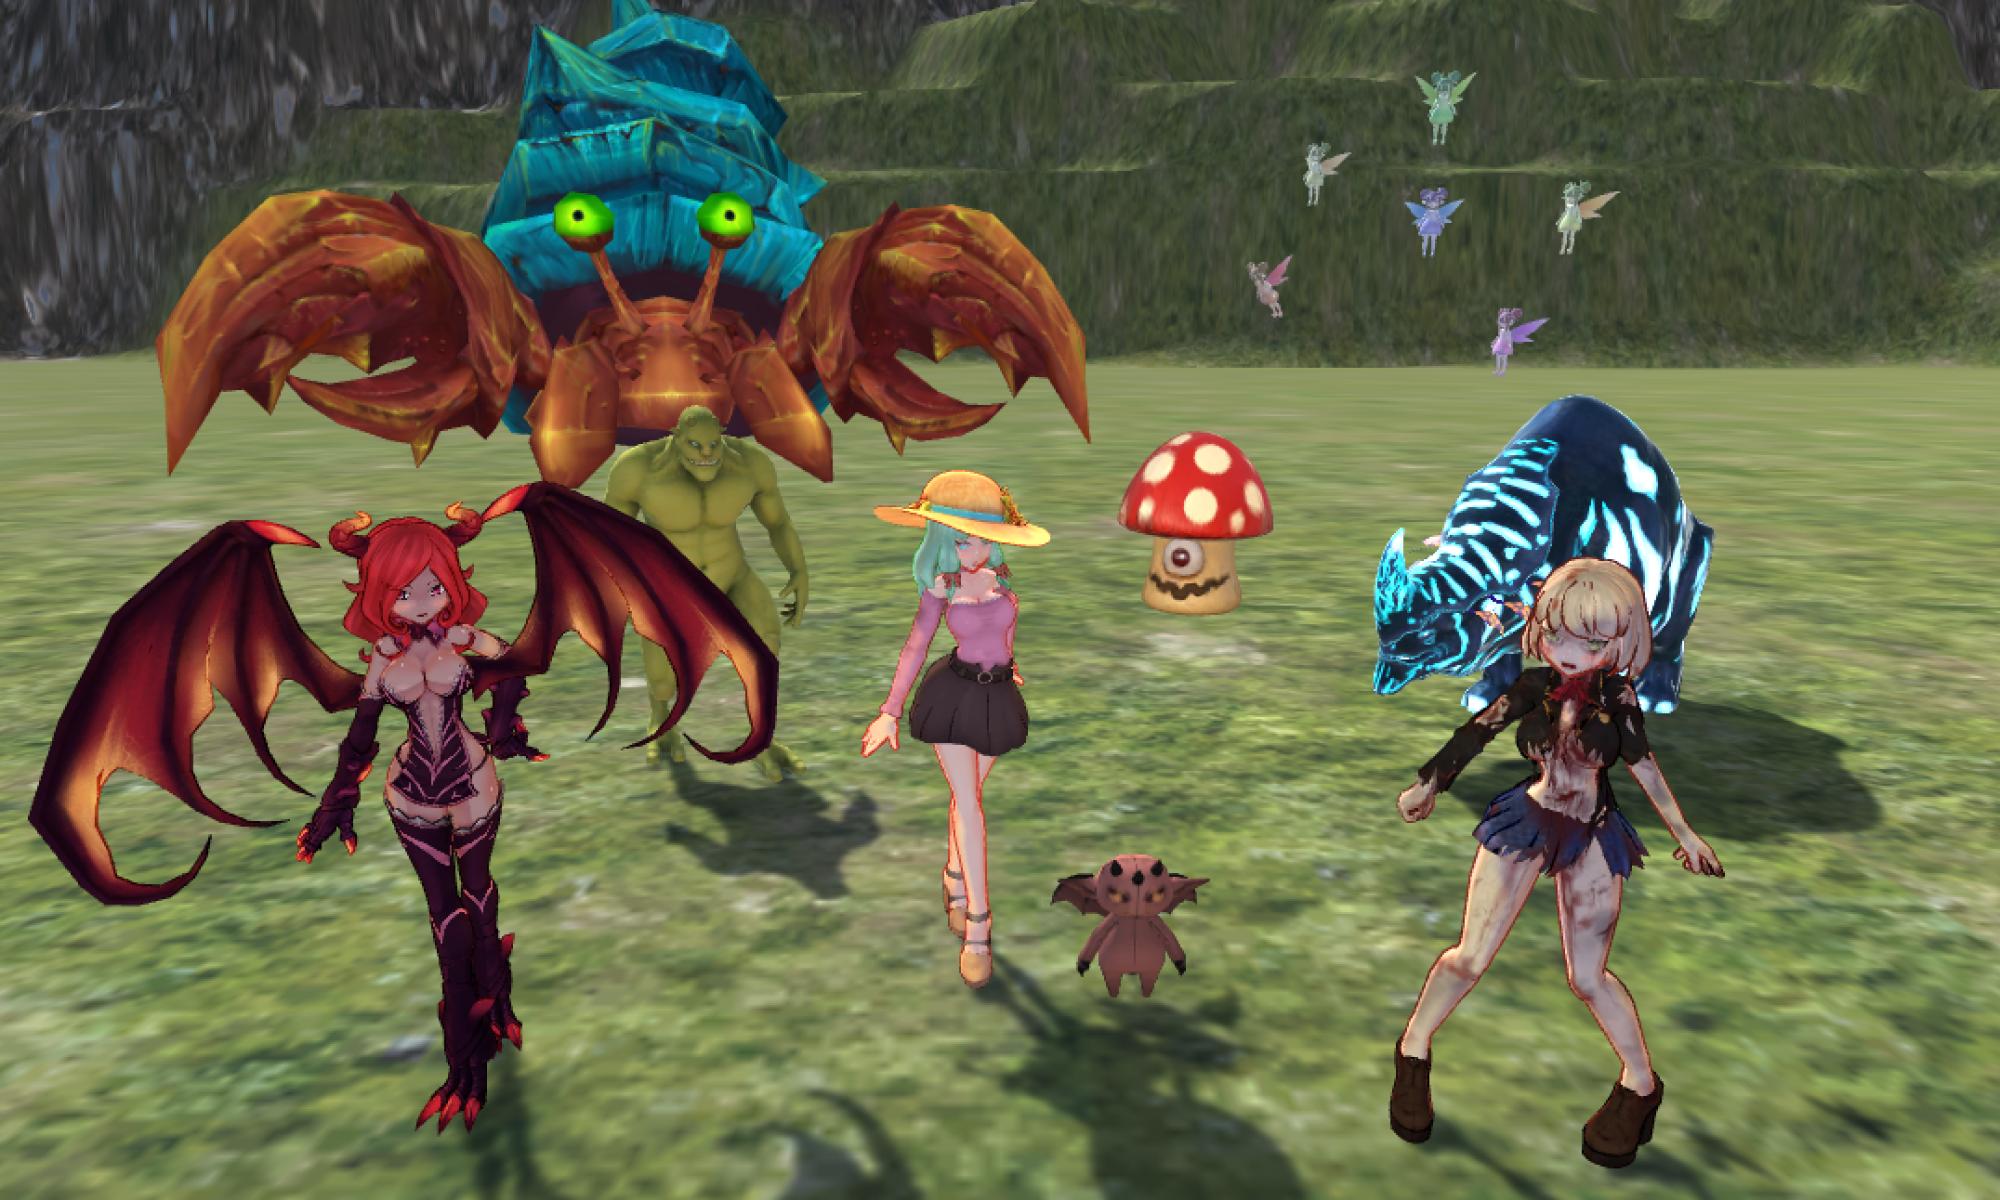 Unityで魔物使い♀ゲームを作る